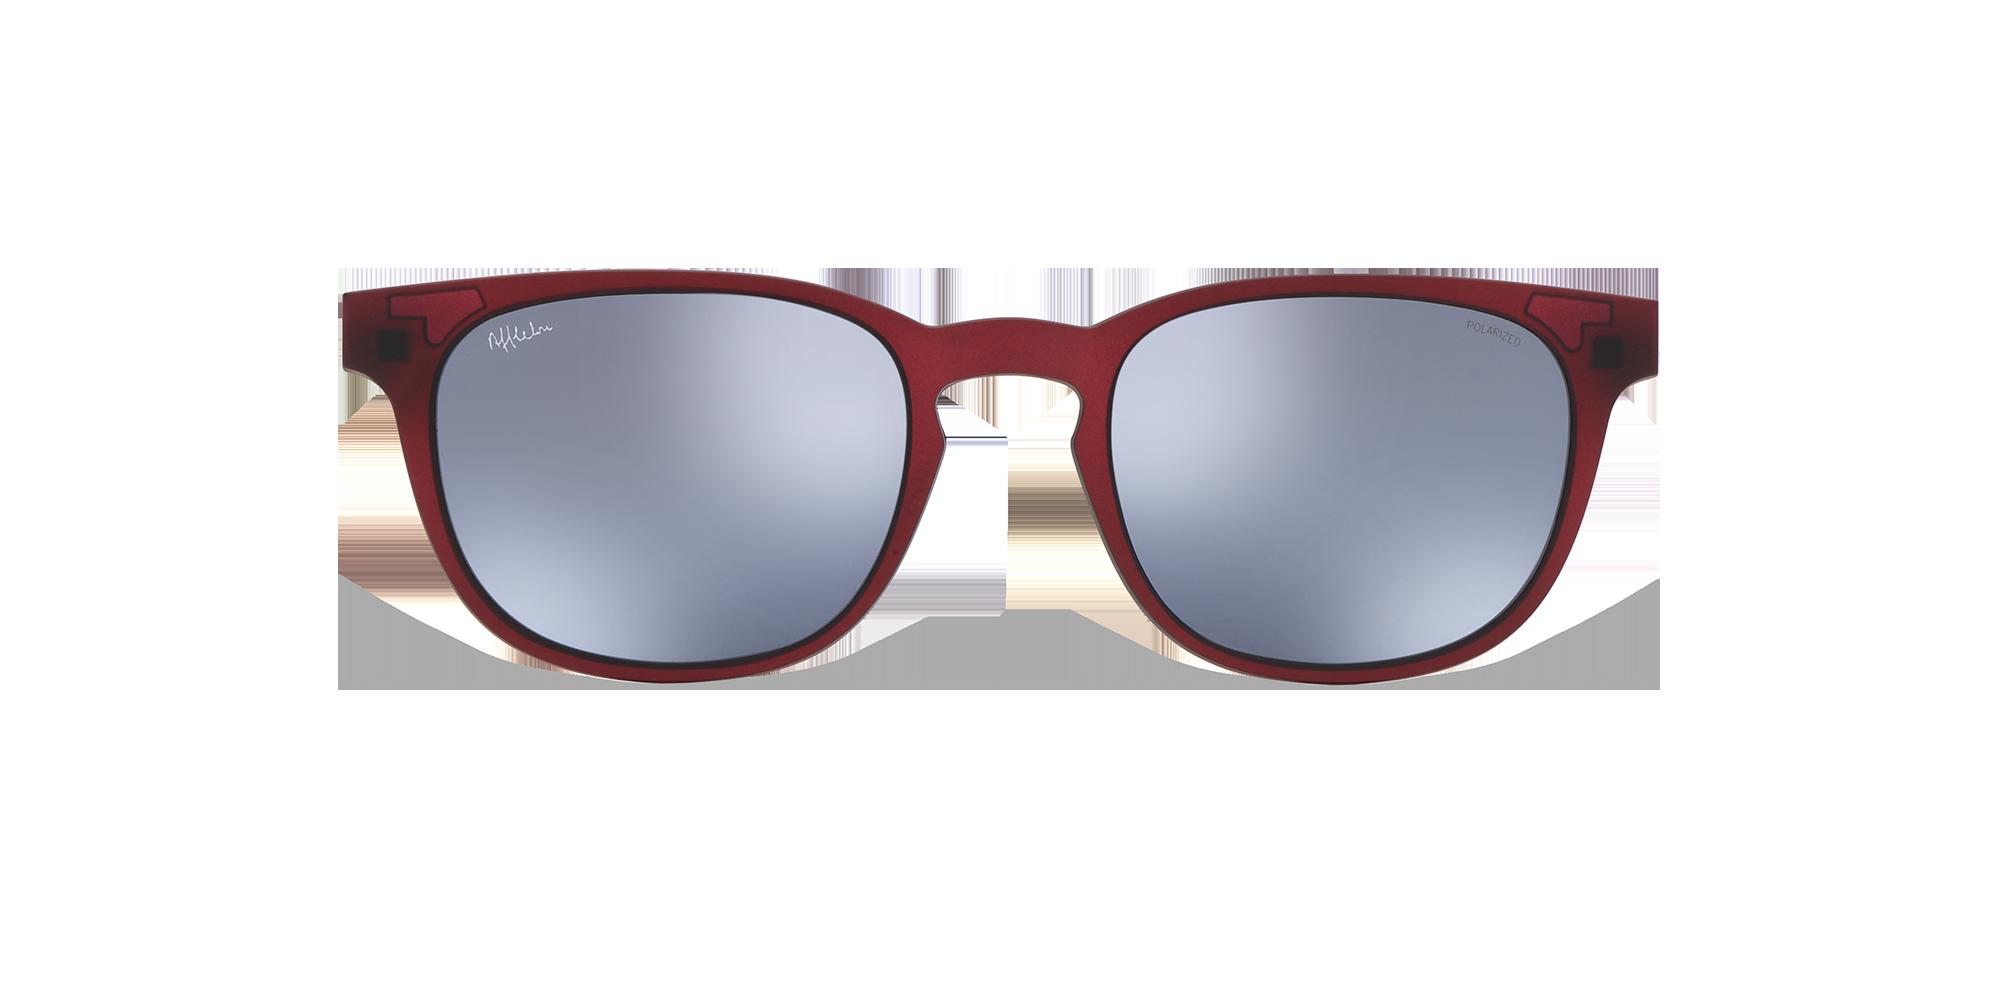 afflelou/france/products/smart_clip/clips_glasses/TMK33PRRD015120.png